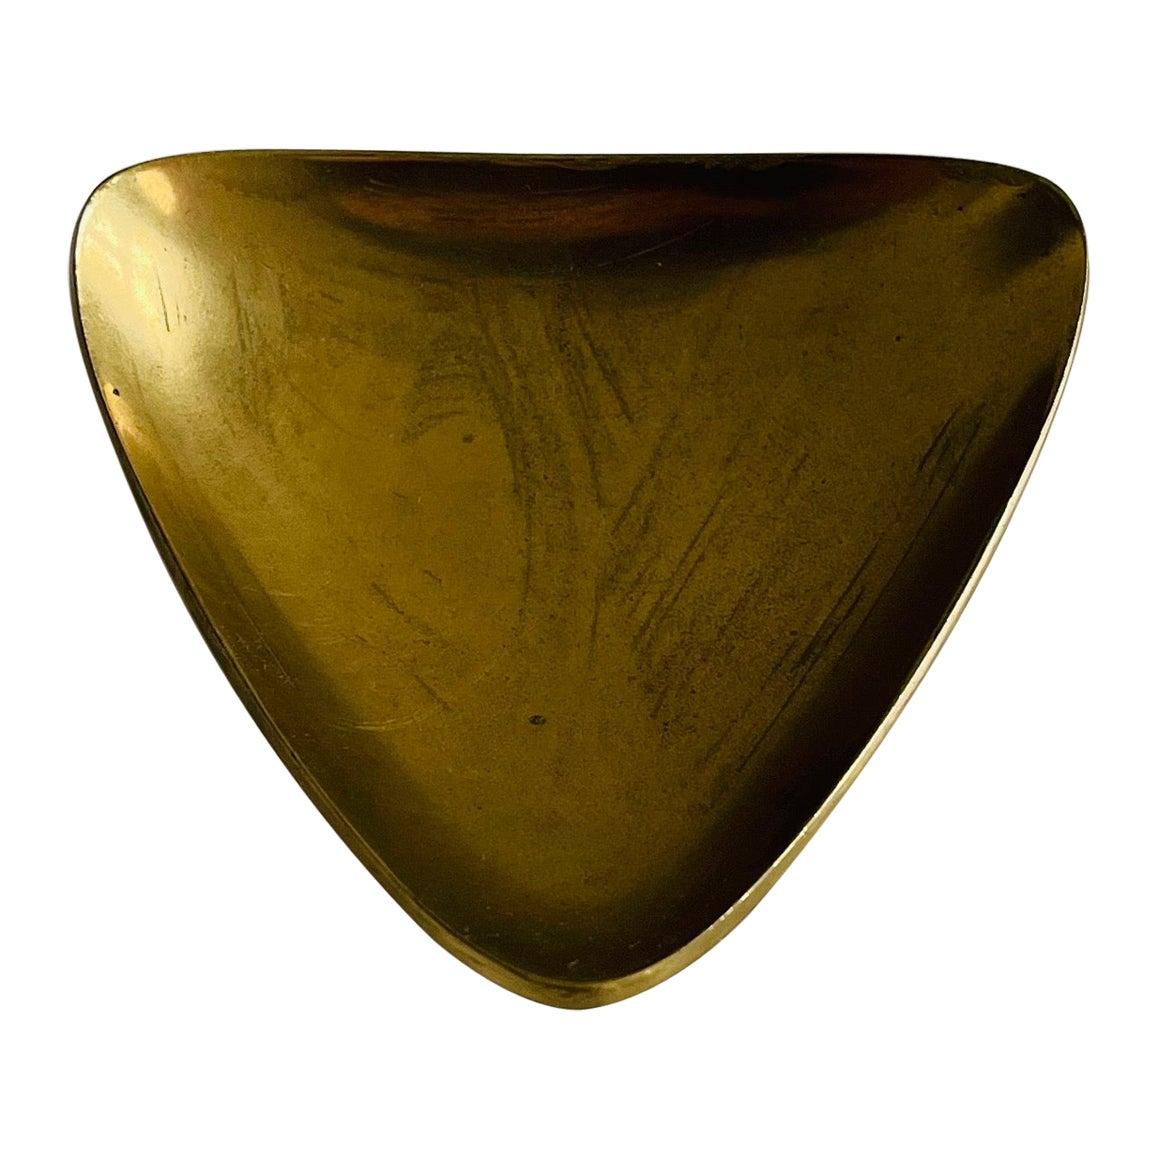 Carl Auböck II Vintage Signed Brass Bowl Ash Tray, Austria, 1950s